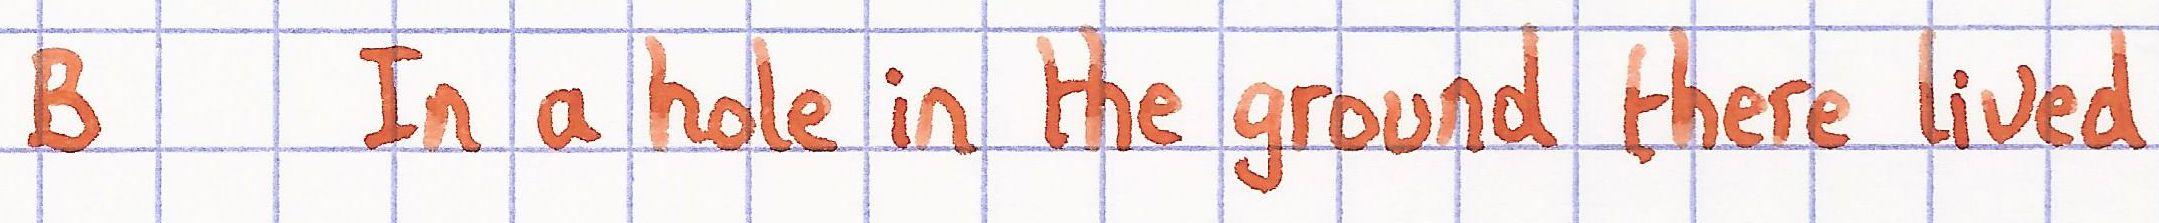 fpn_1565879628__j_herbin_-_orange_indien